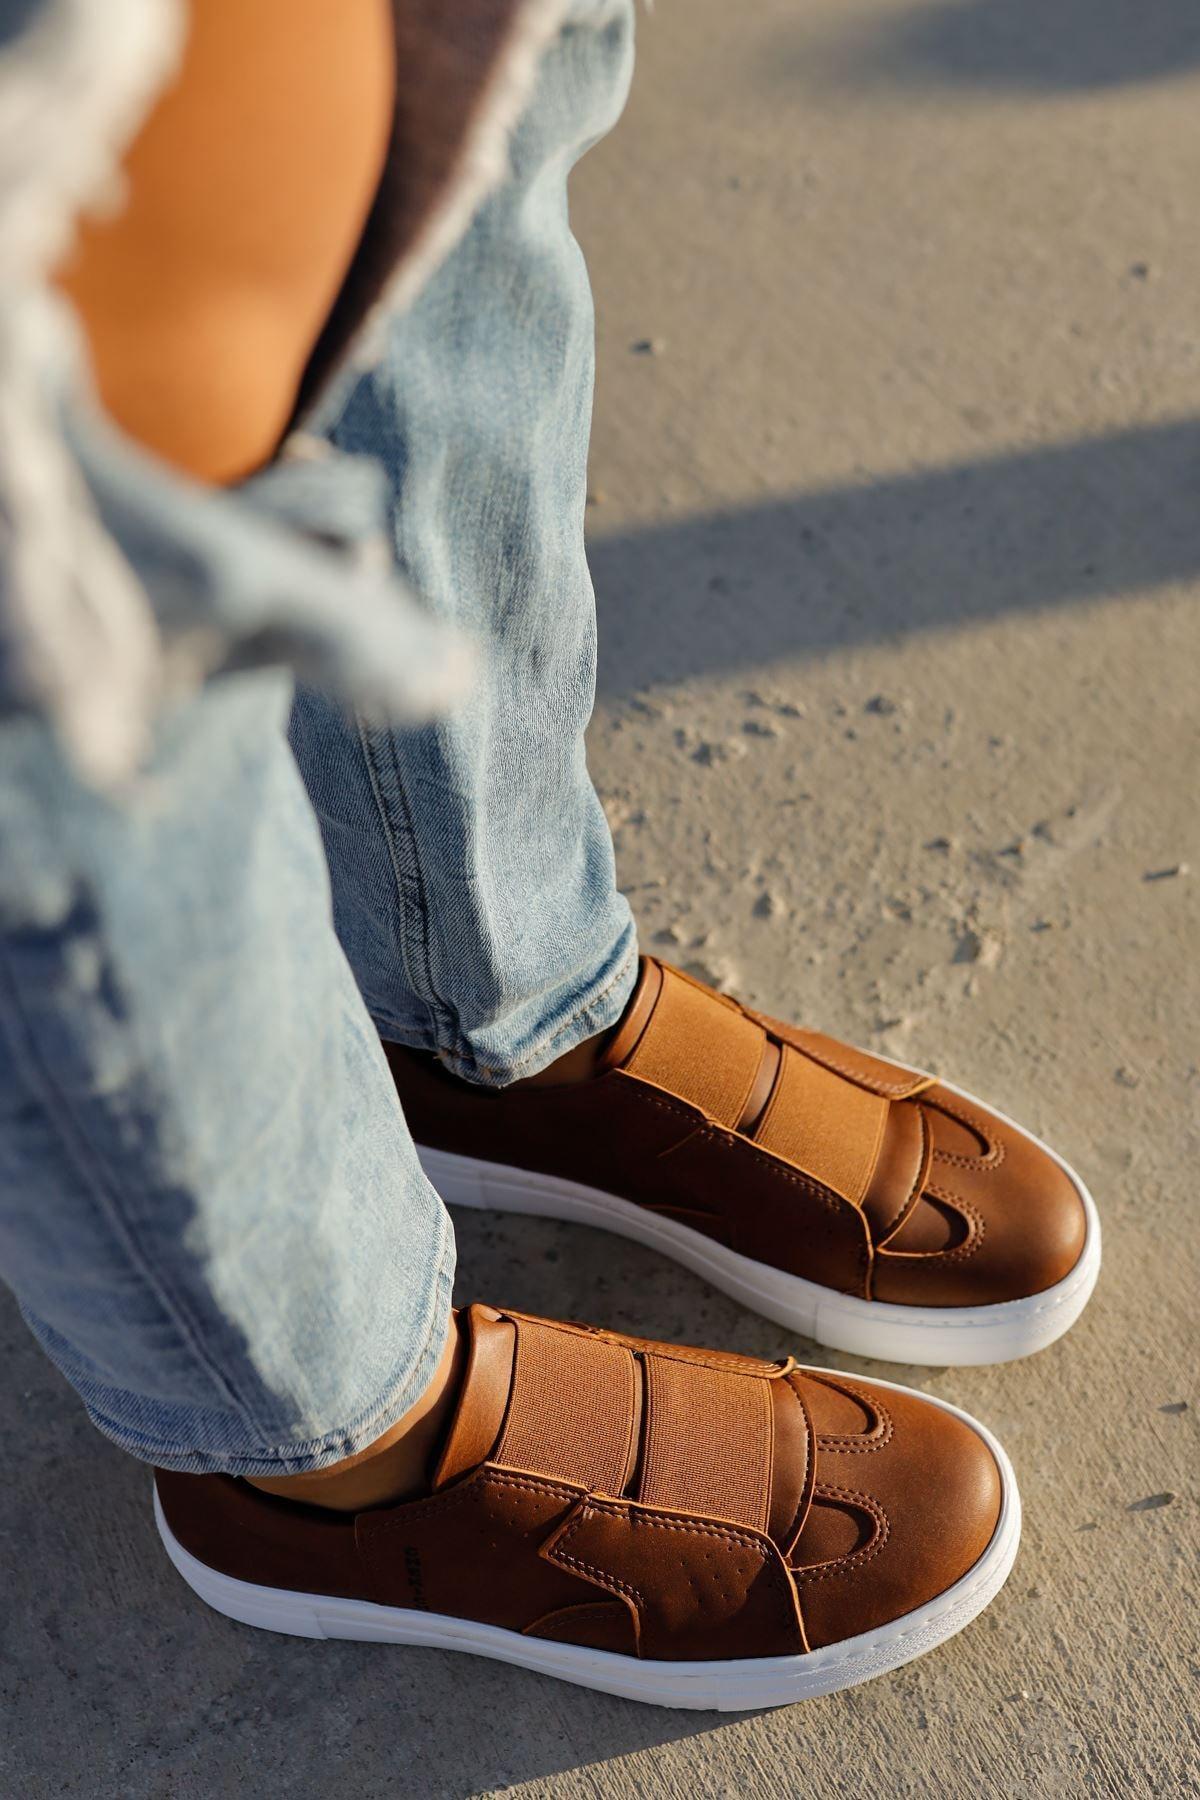 Chekich Ch033 Bt Kadın Ayakkabı Taba 1